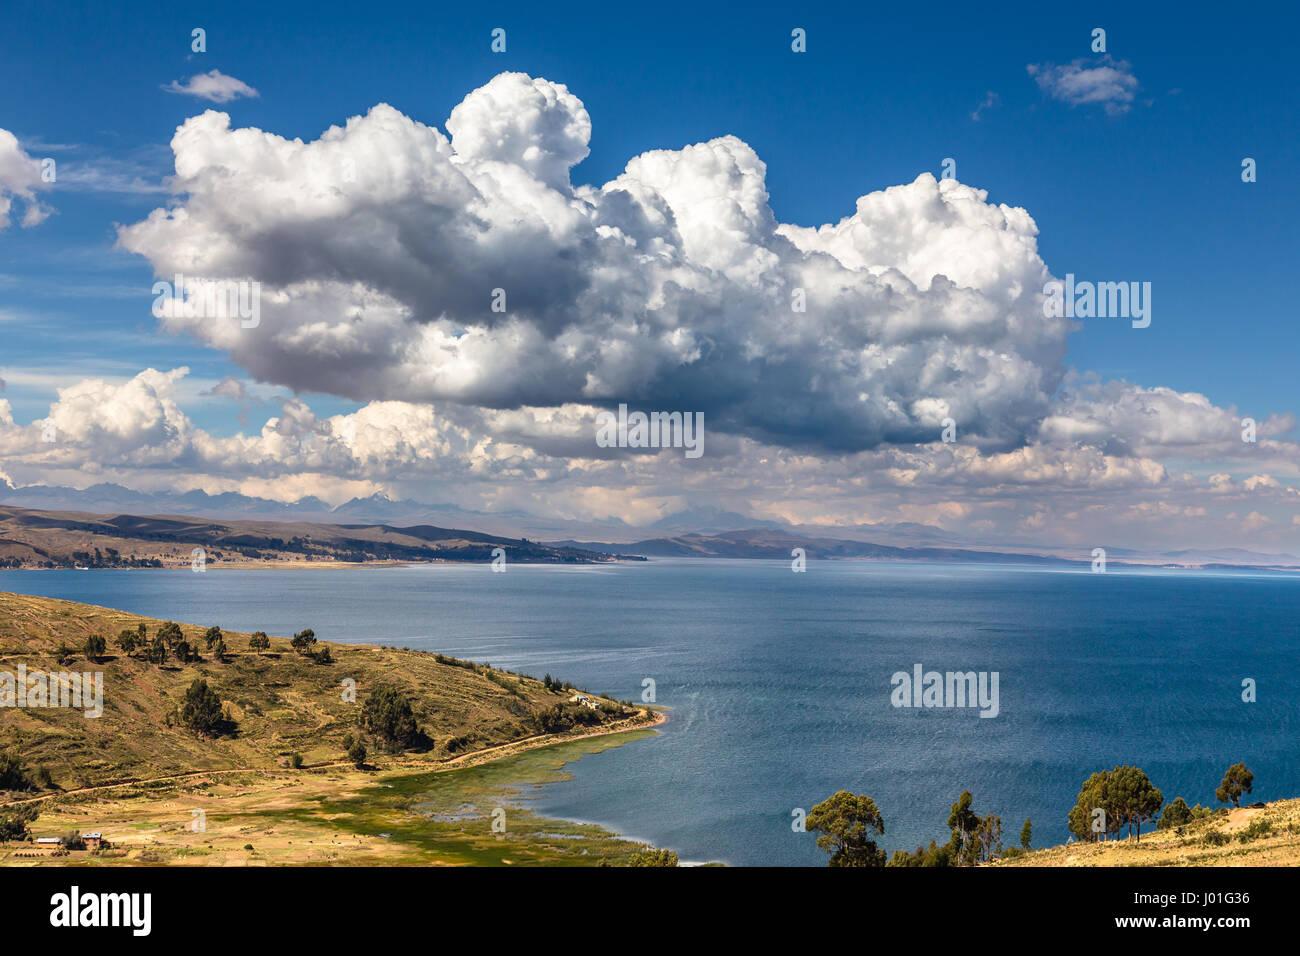 Clouds over Titticaca lake, Bolivia - Stock Image